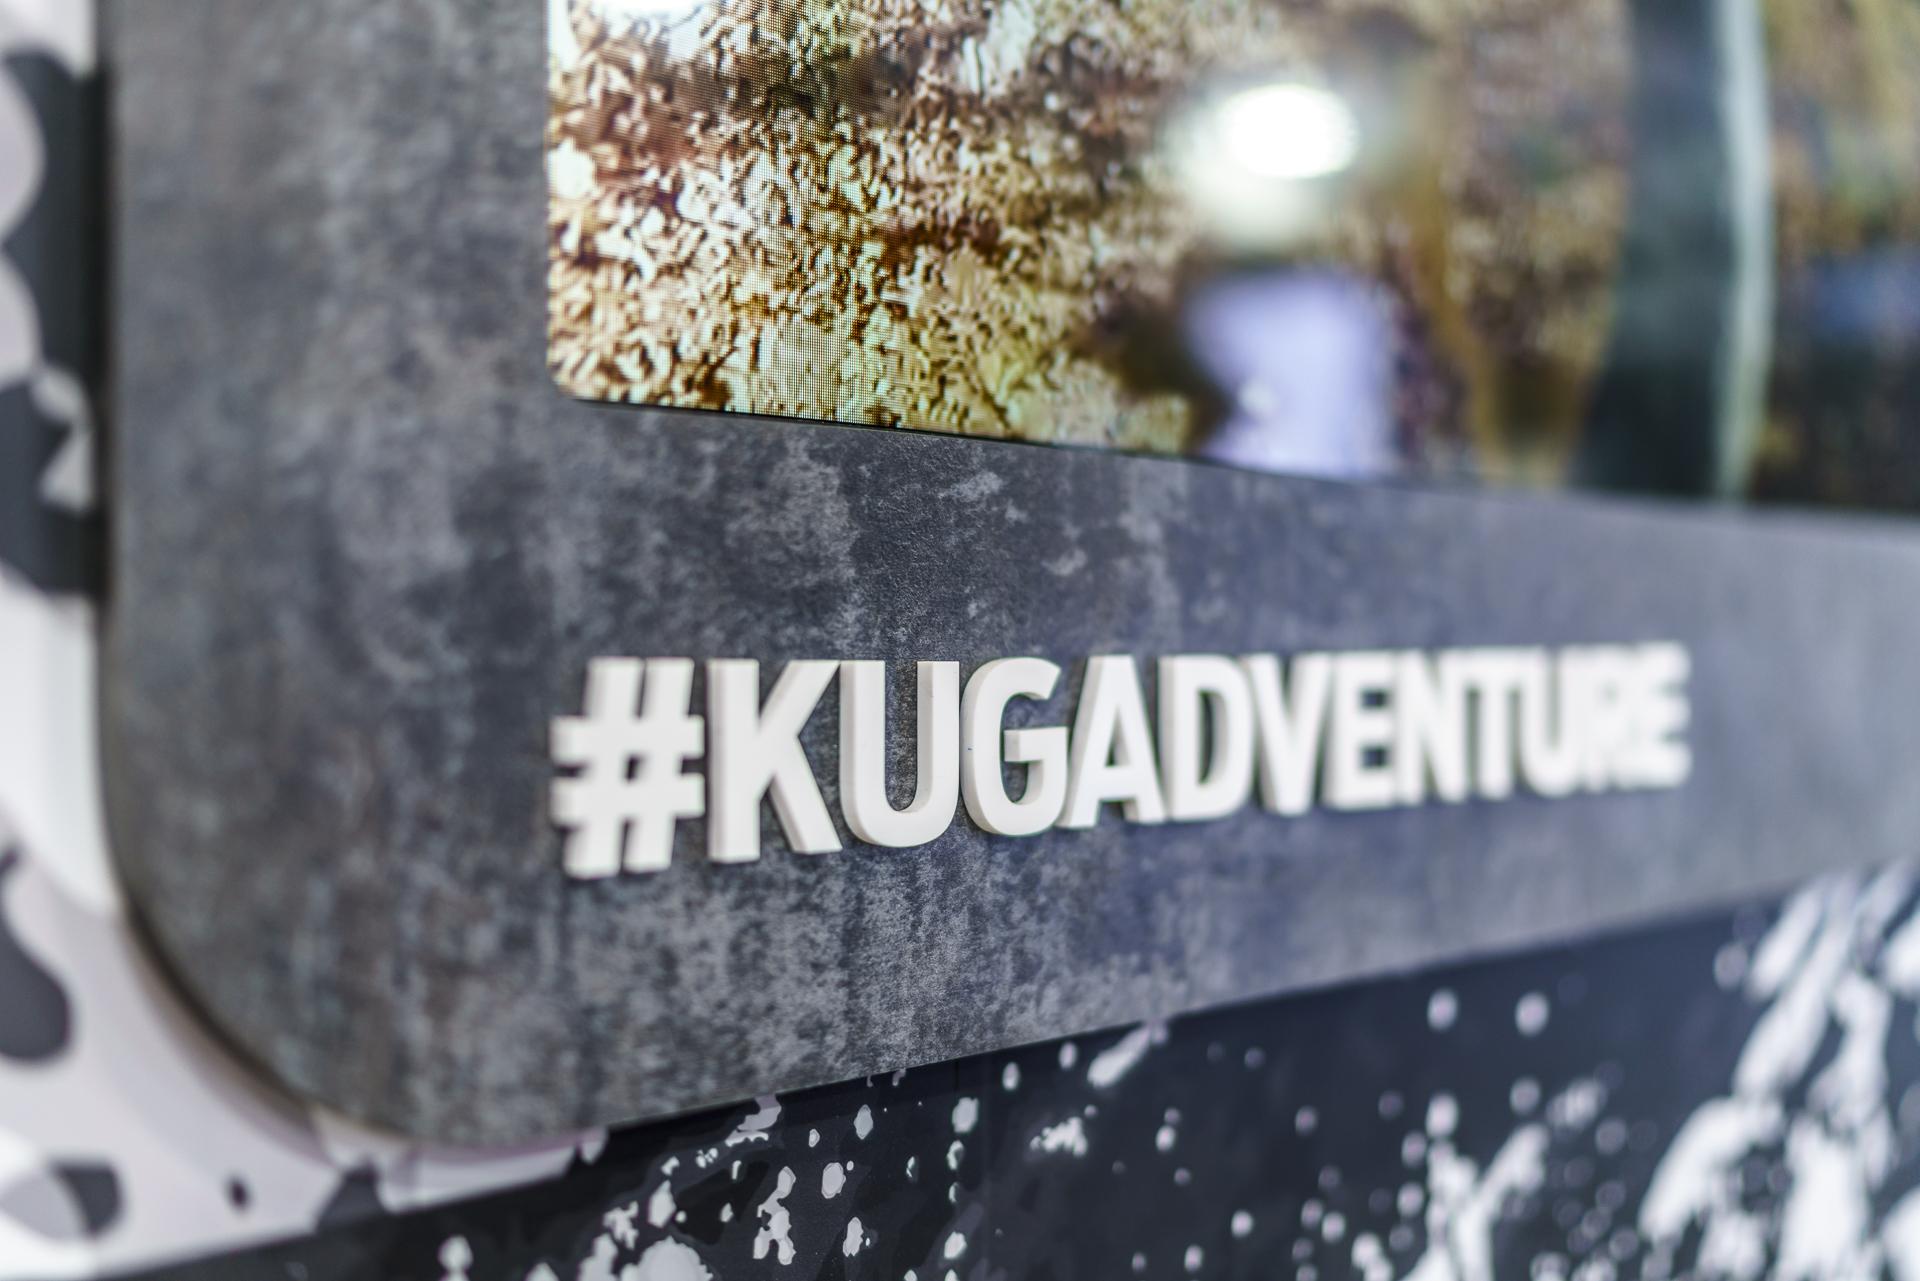 kugadventure-ford